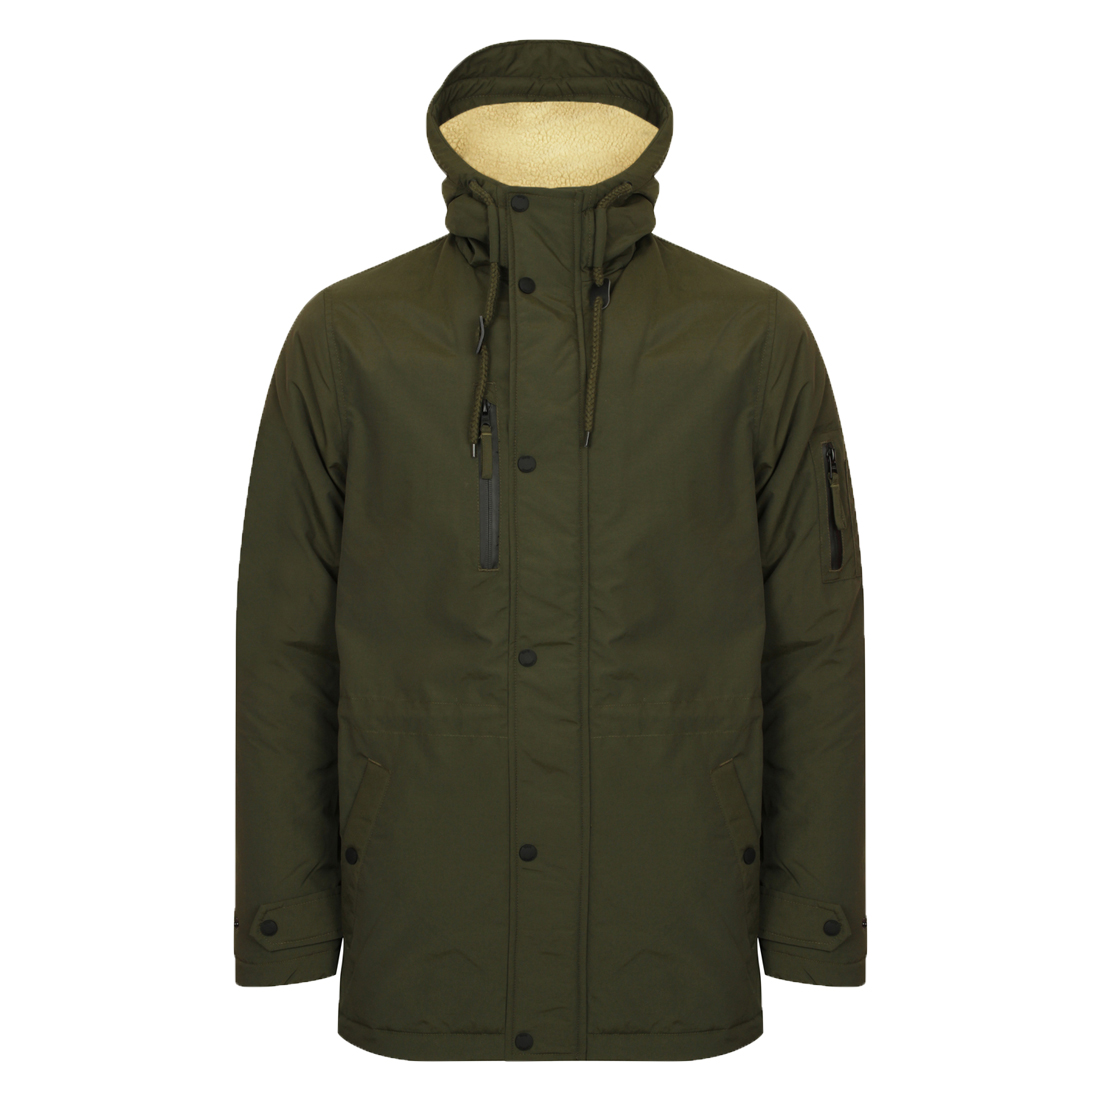 Winter Coat Brand - Tradingbasis